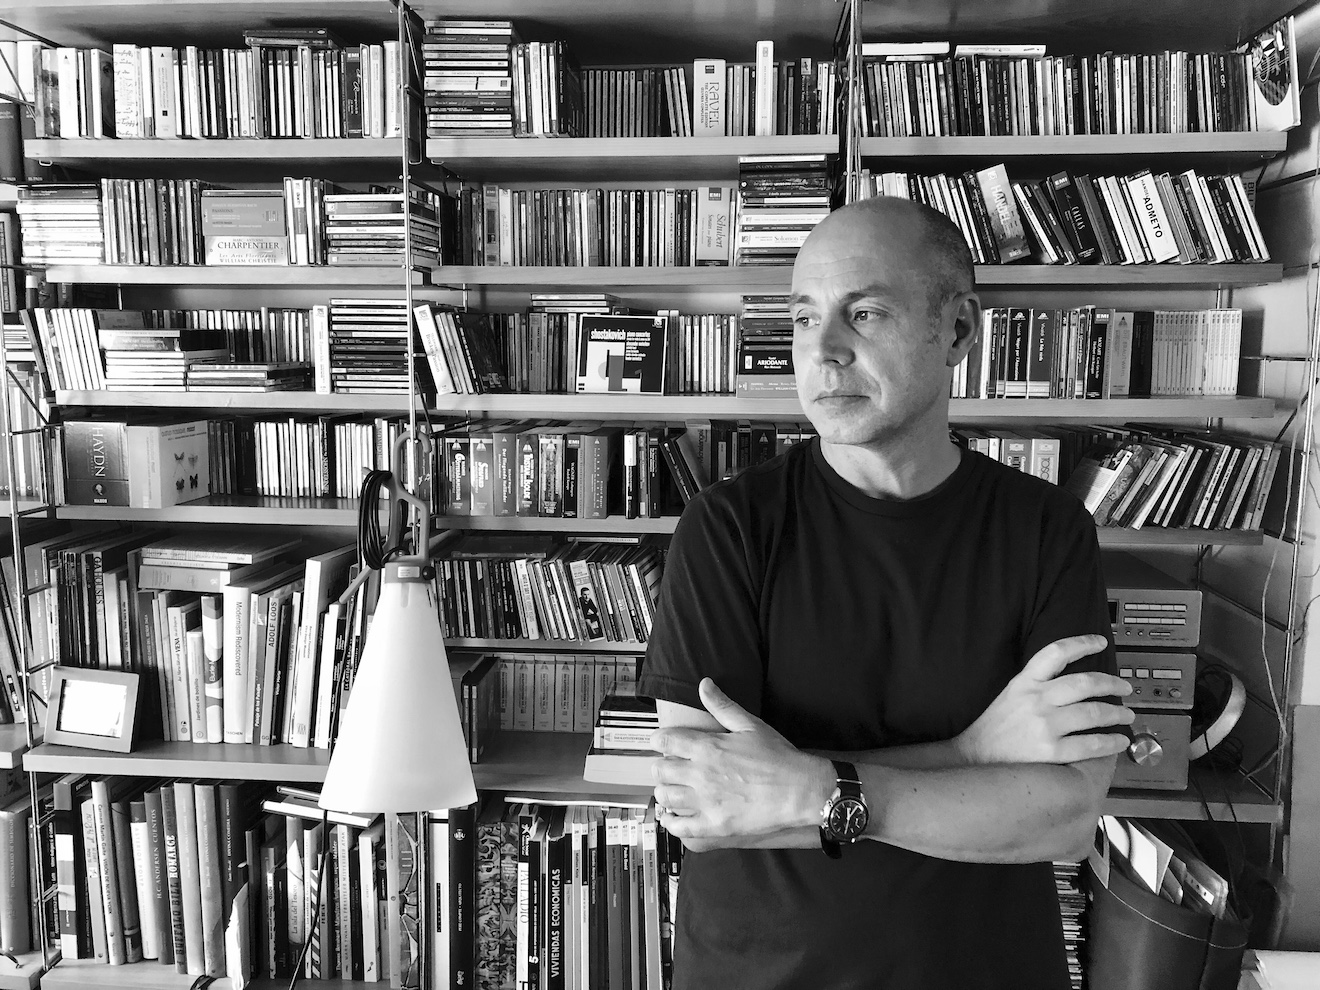 Rafa Martínez, el editor y galerista ocasional